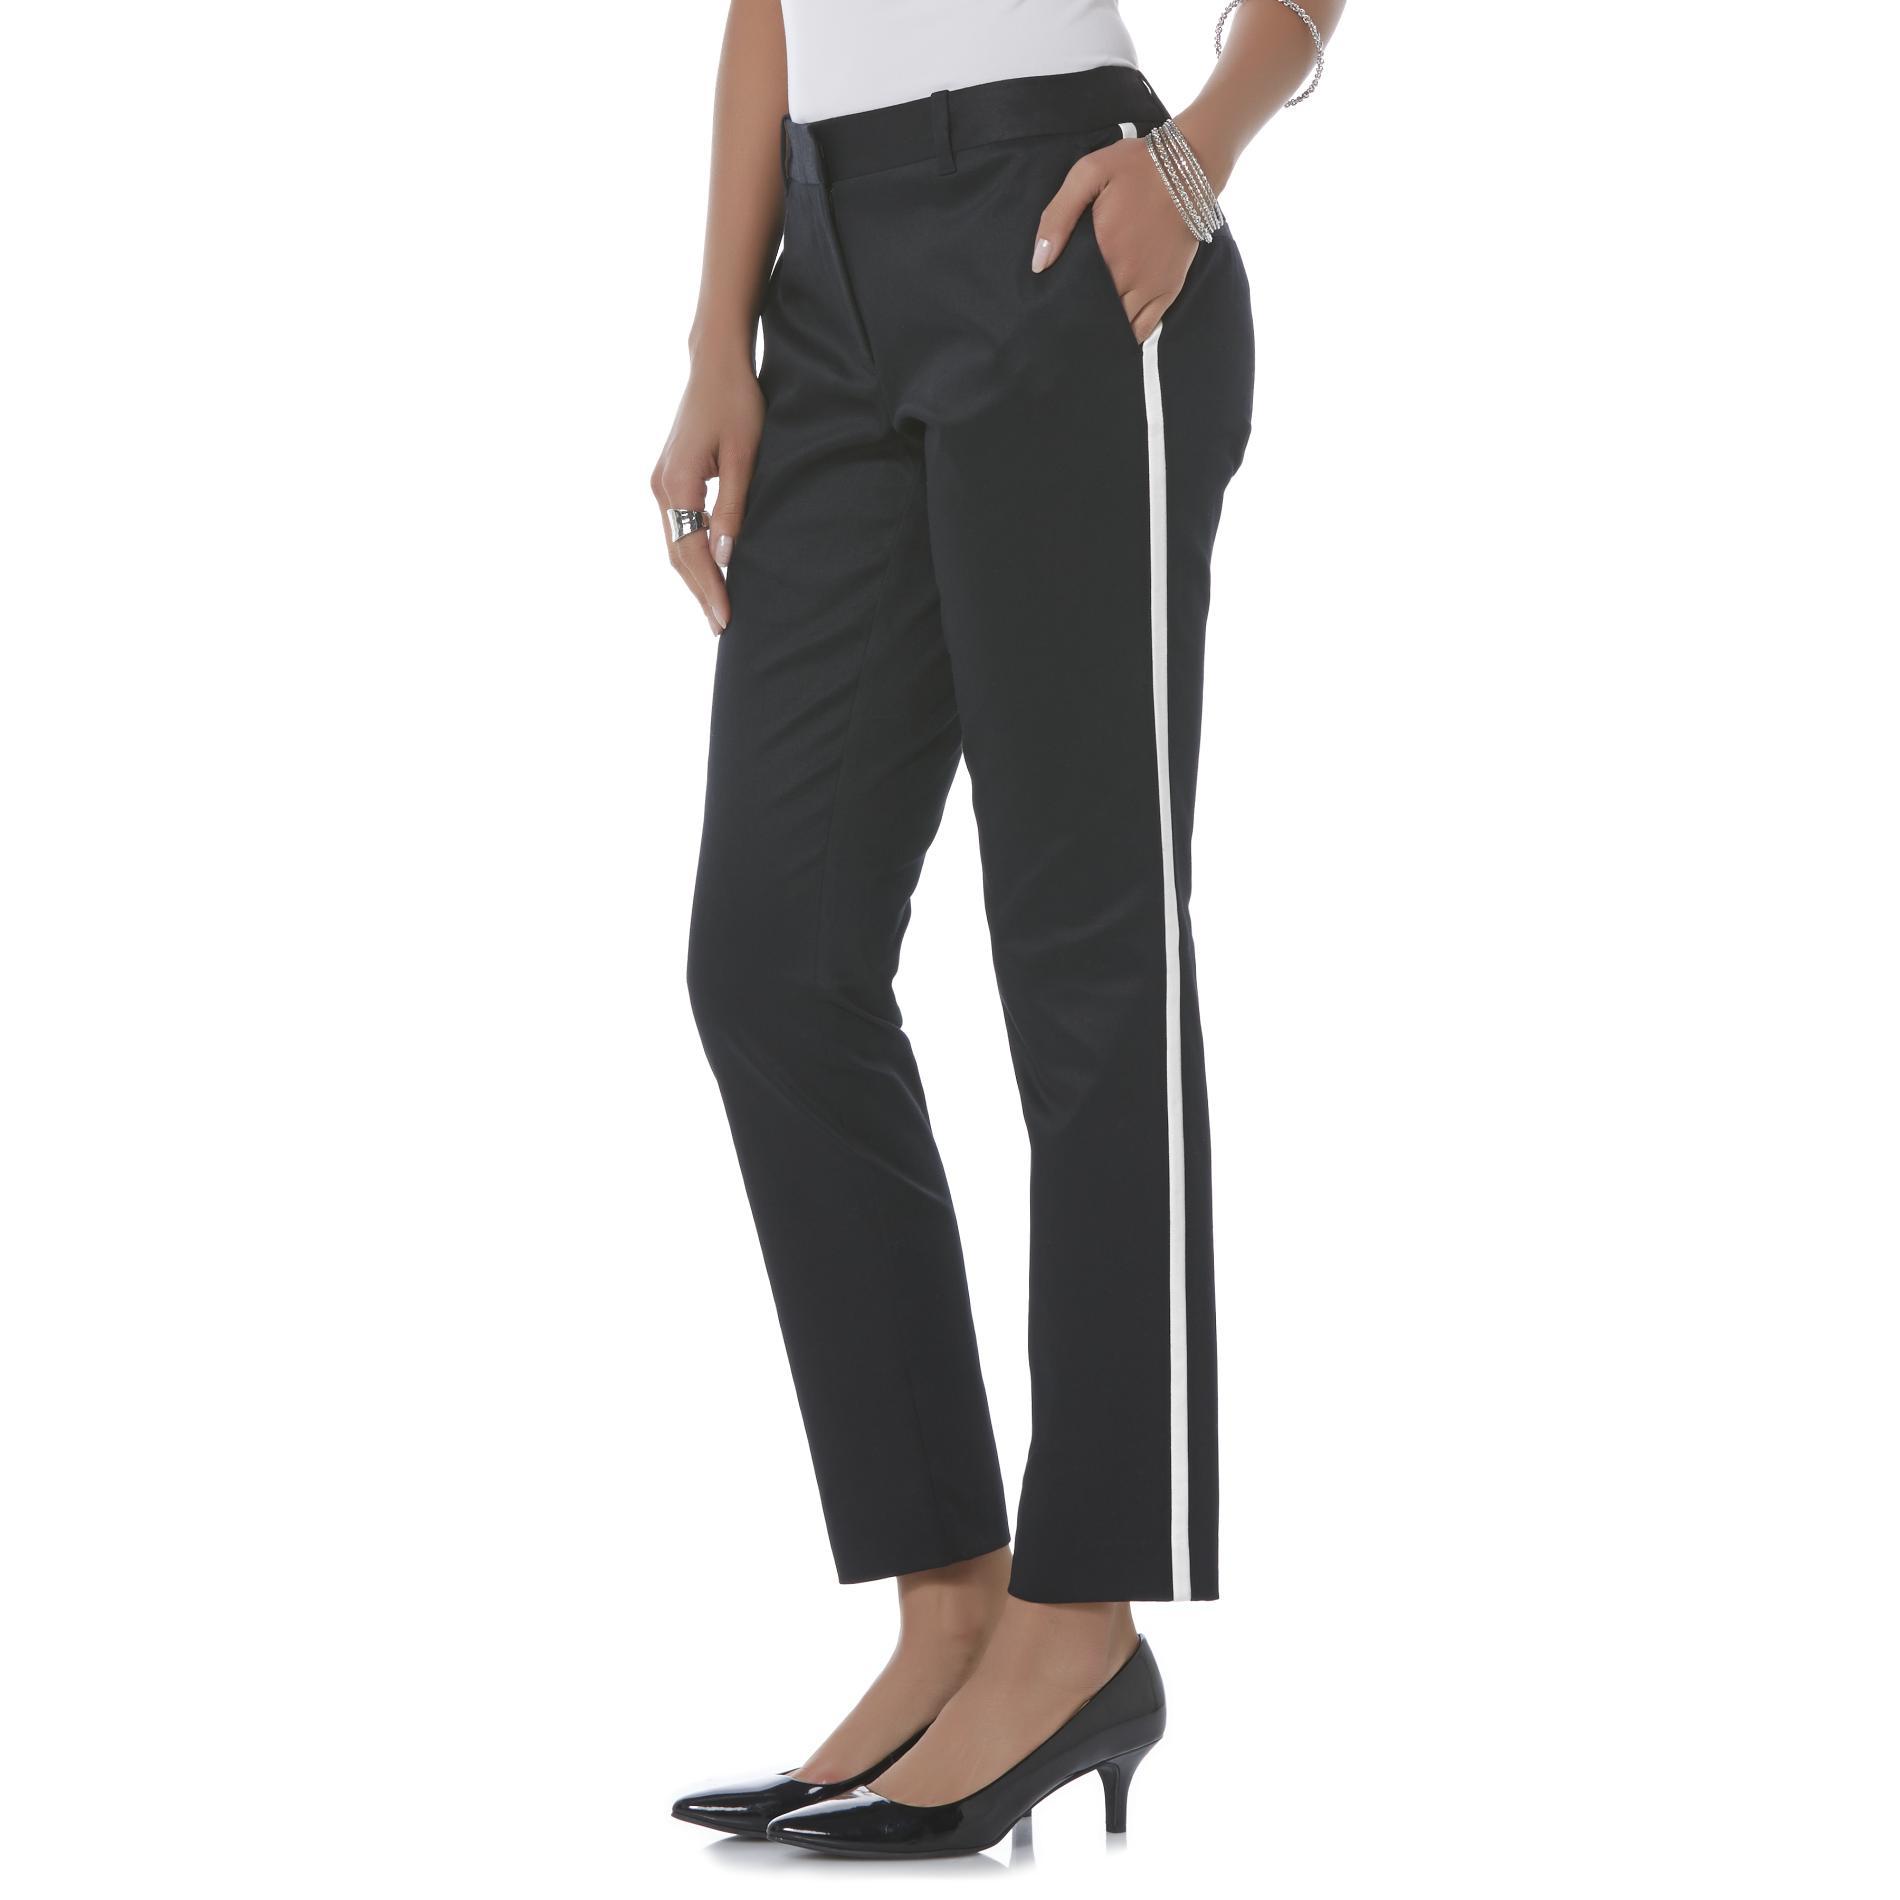 Metaphor Women's Dress Pants - Tuxedo Stripe